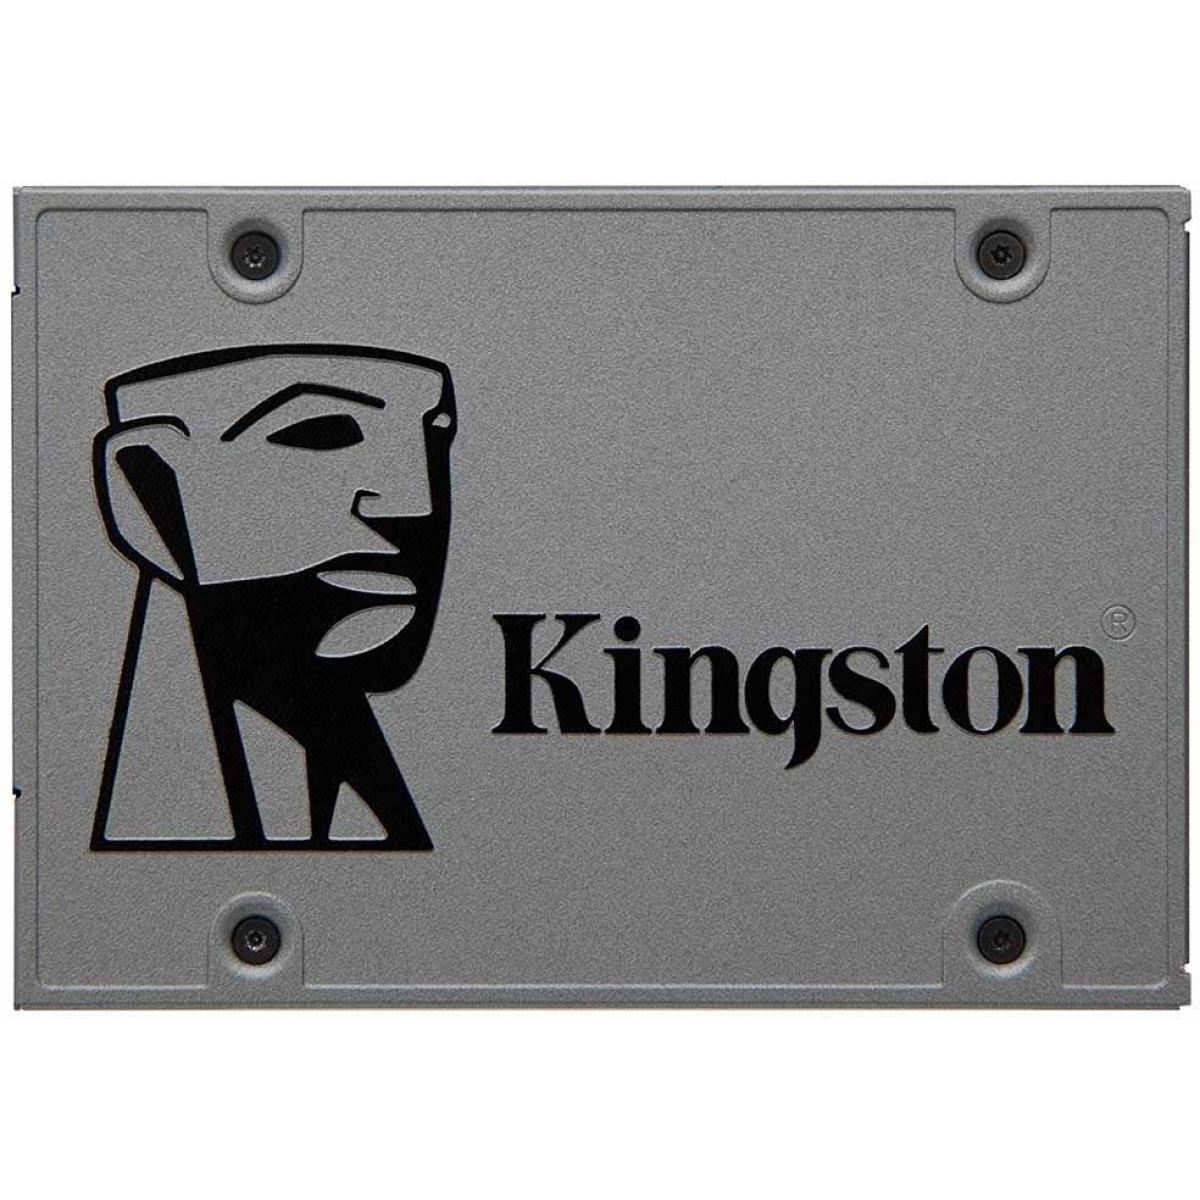 SSD Kingston UV500, 480GB, Sata III, Leitura 520MBs e Gravação 500MBs, SUV500/480G